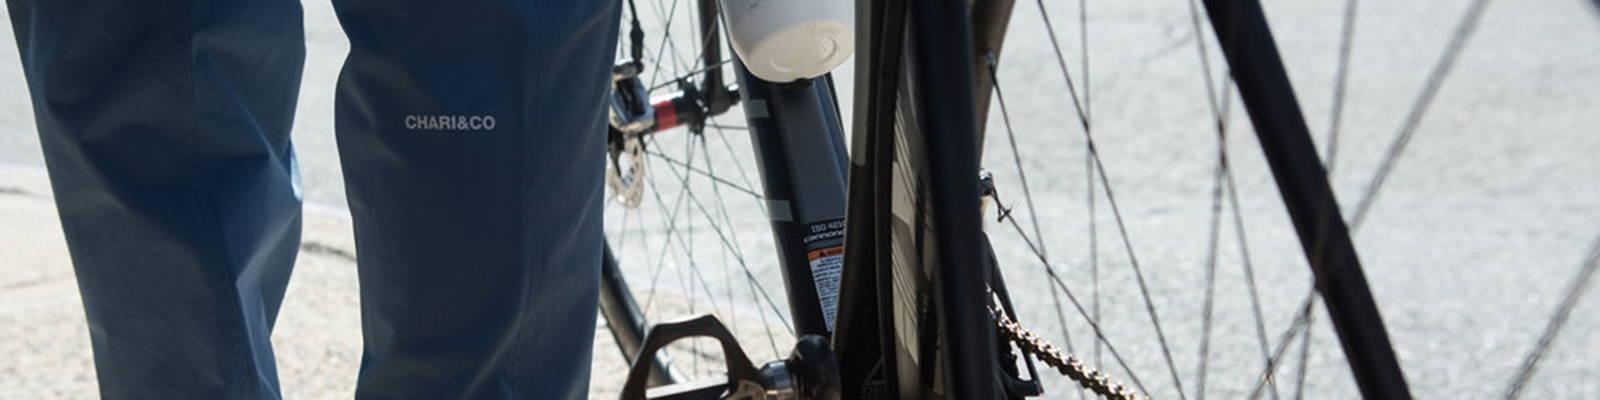 Chari & Co model with bike